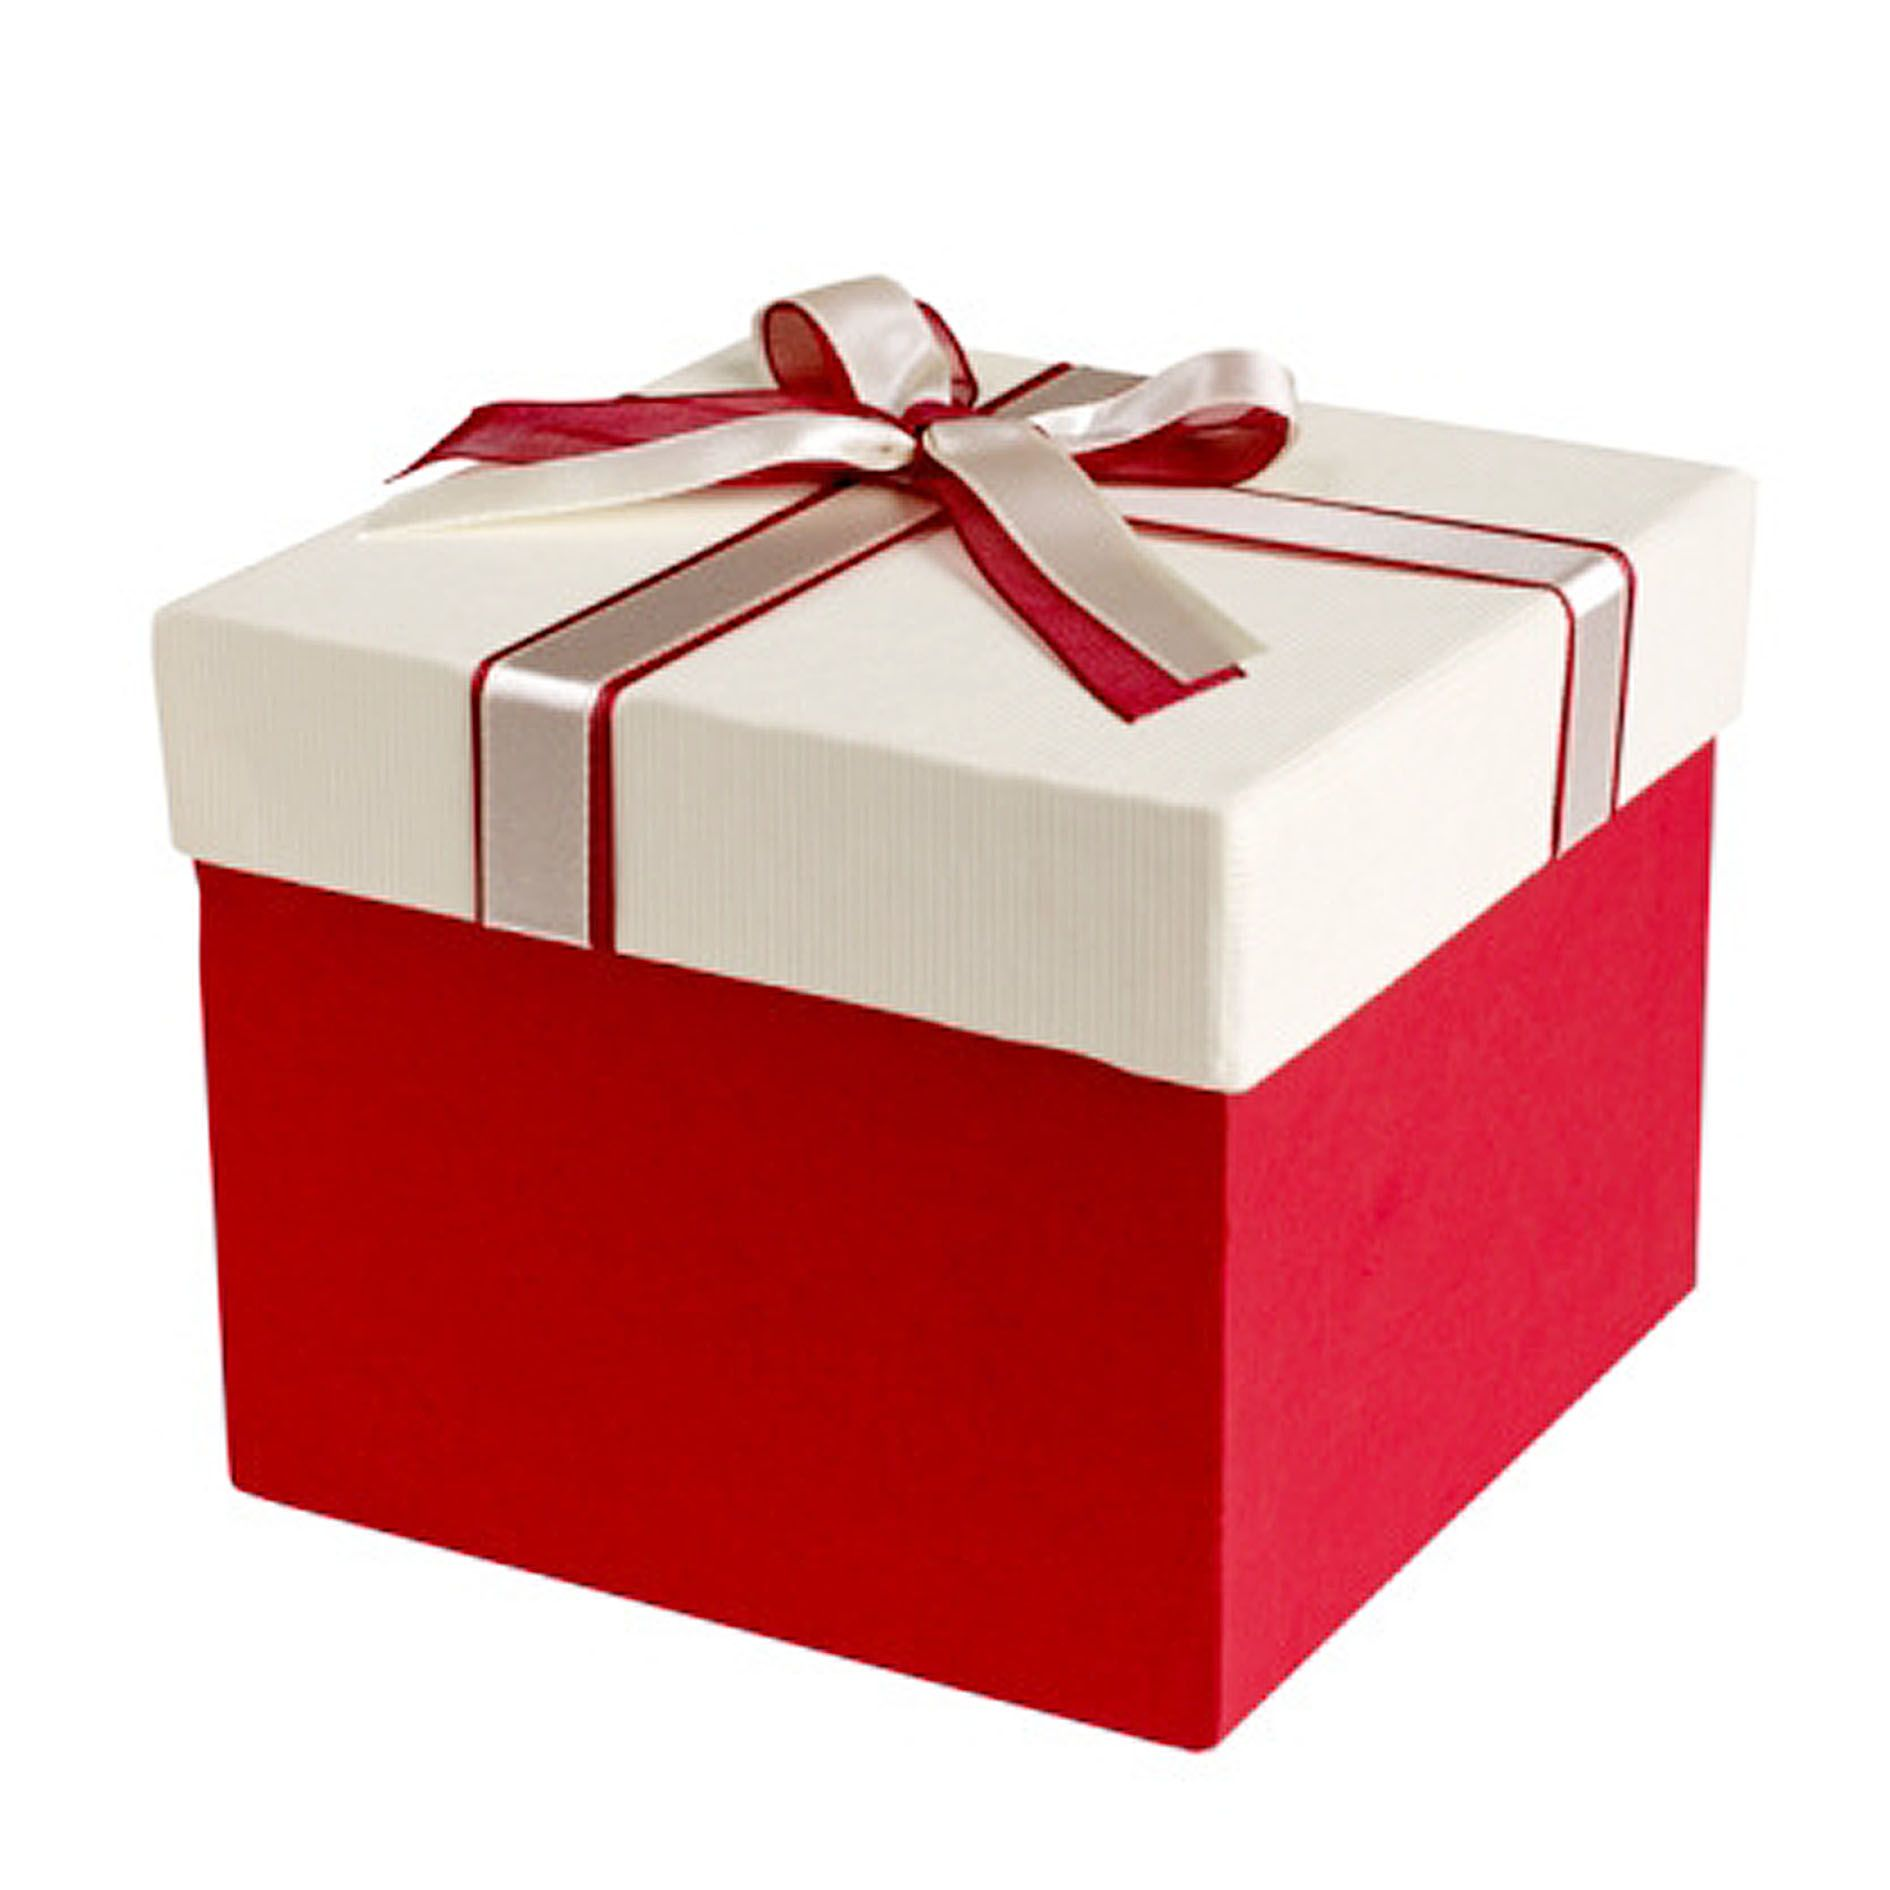 Gift Box (GD-GT035) | Gift Wrap Room | Pinterest | Box, Christmas ...